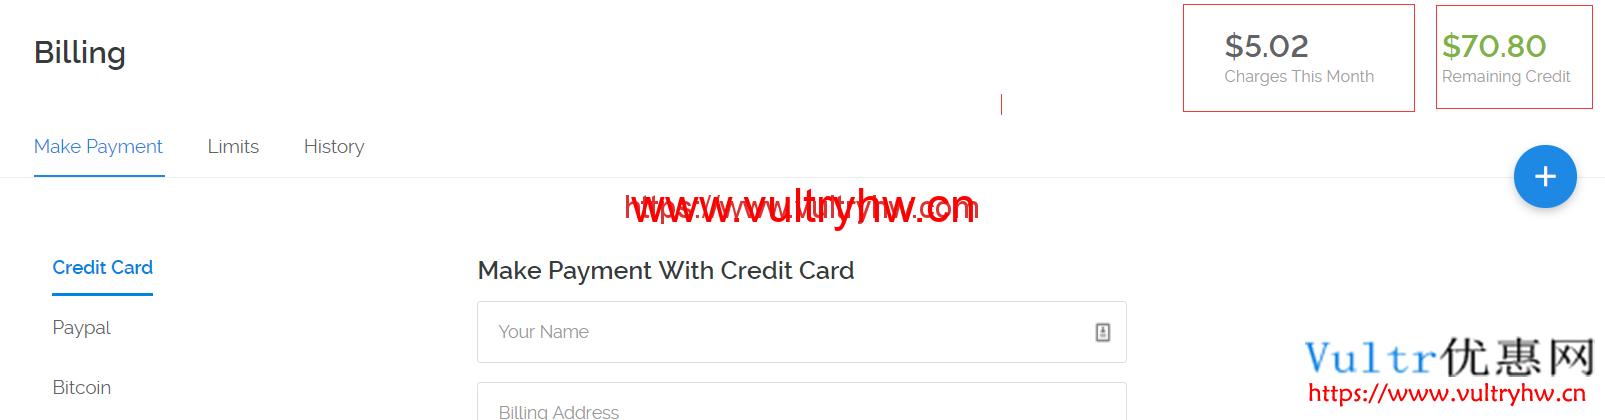 Vultr每月账单